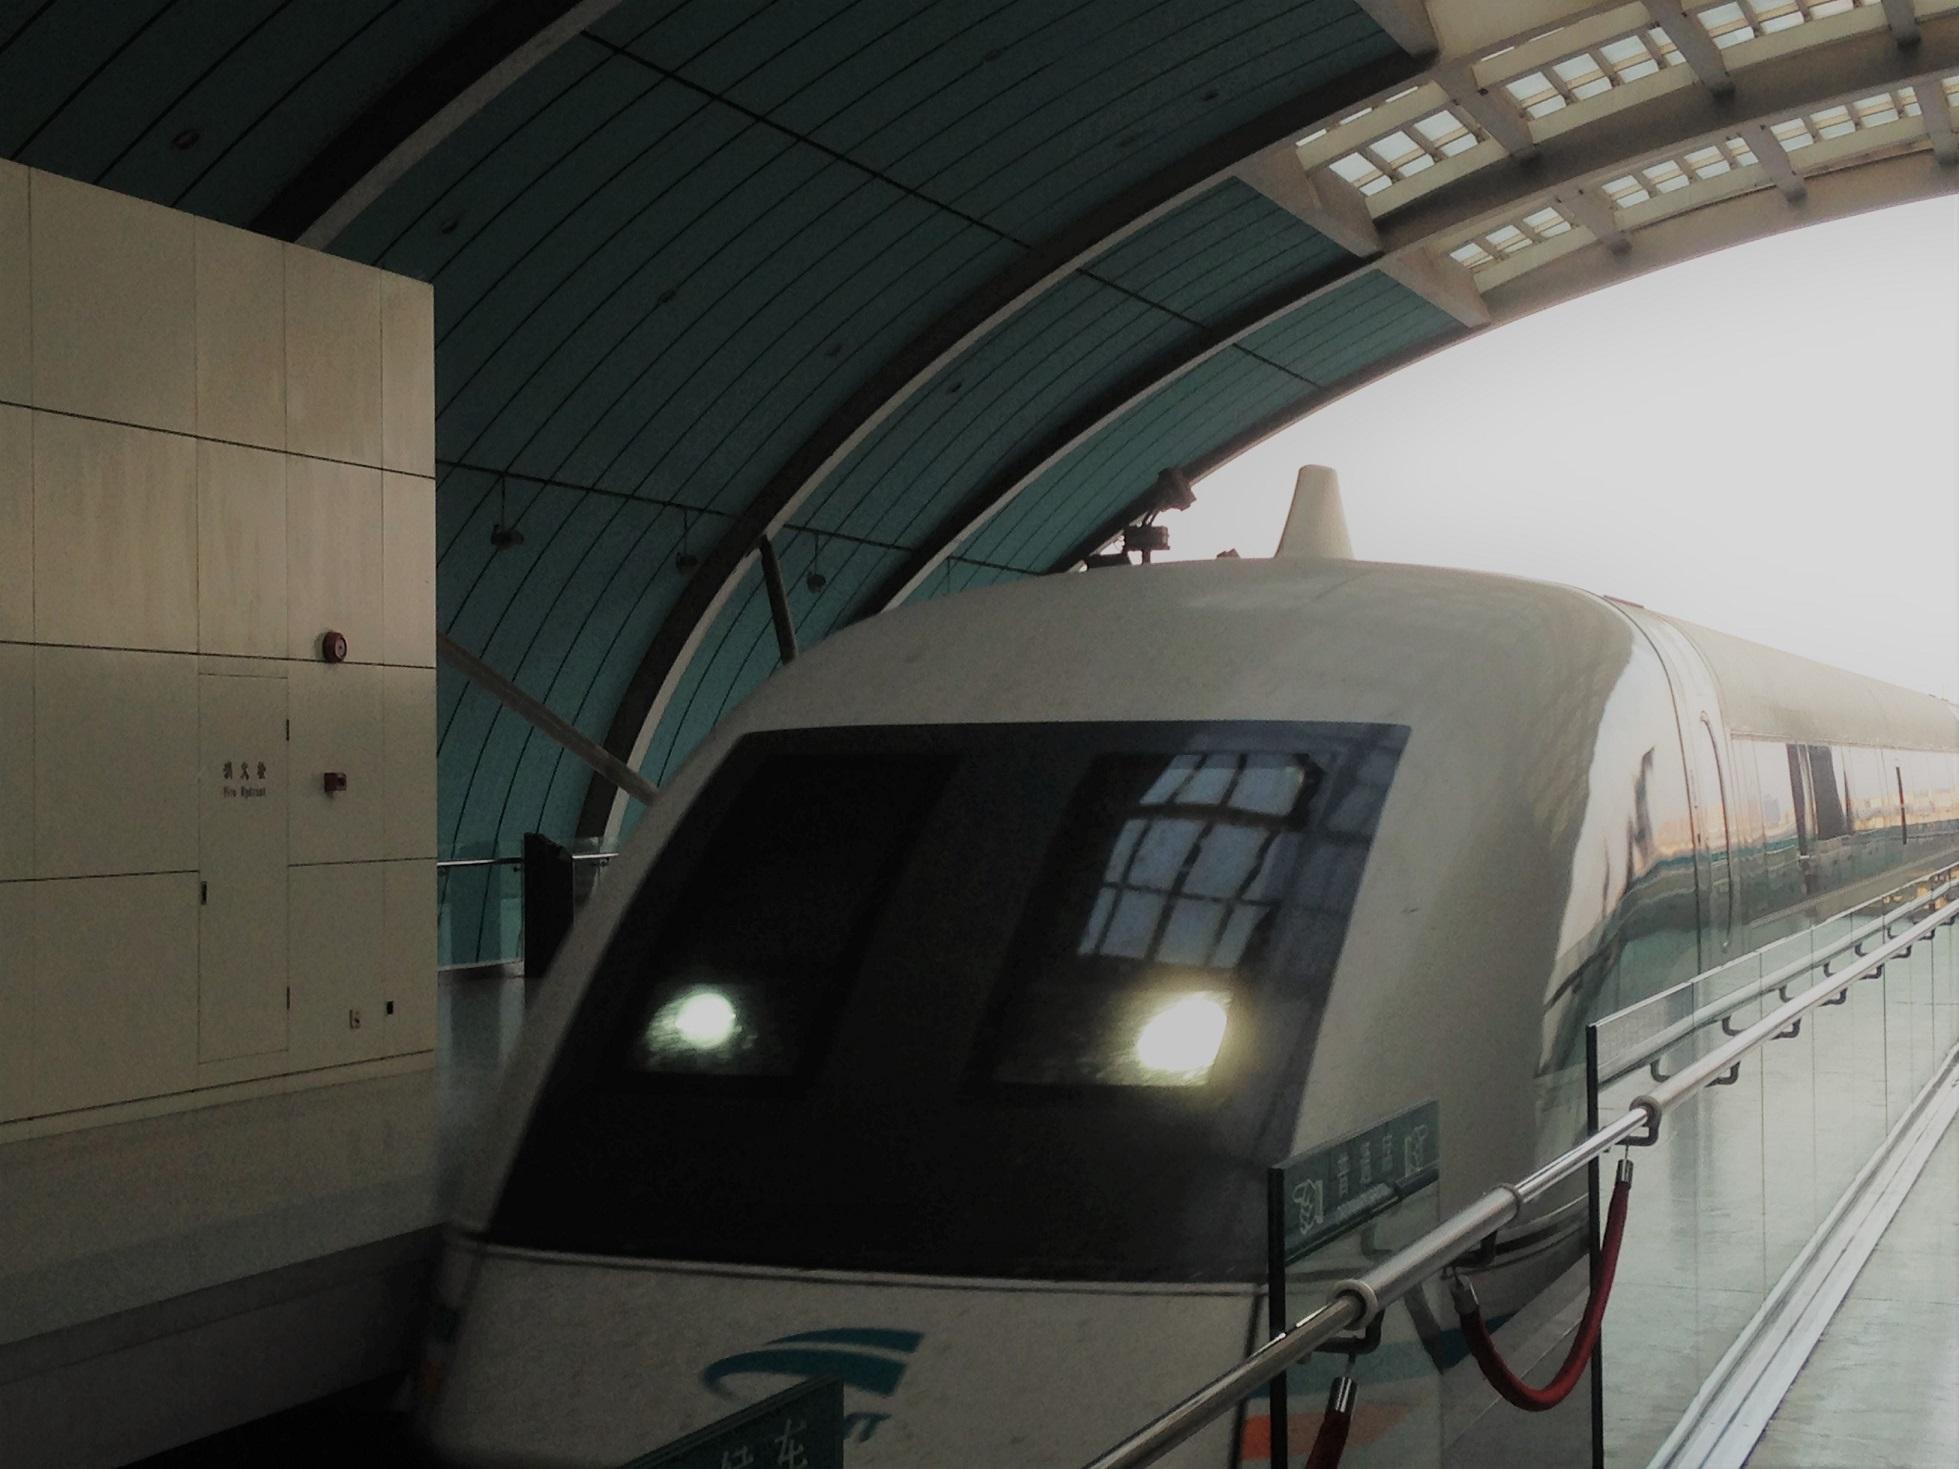 Bullet train Maglev Shanghai